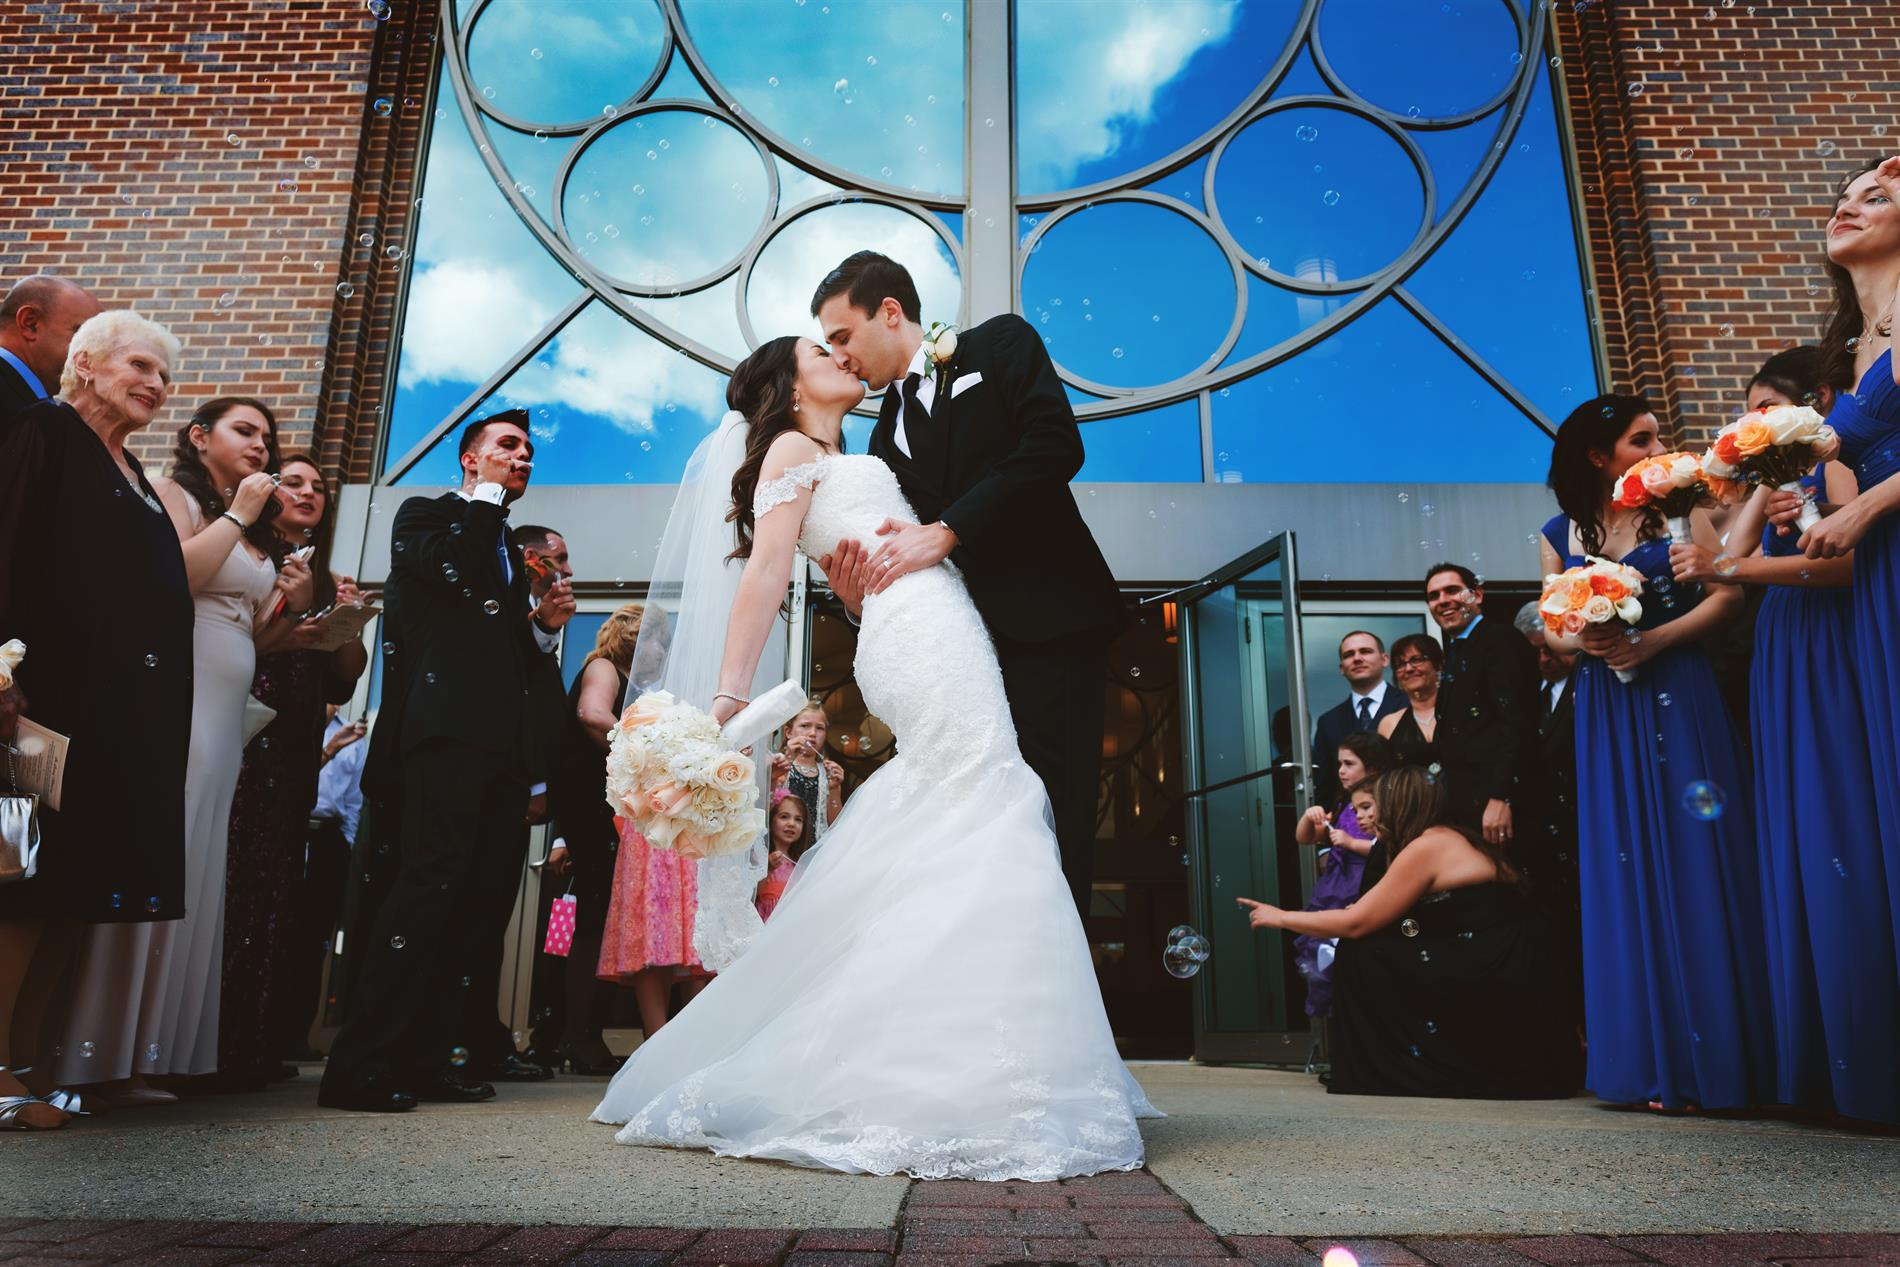 Scott & Jessica Wedding Photos